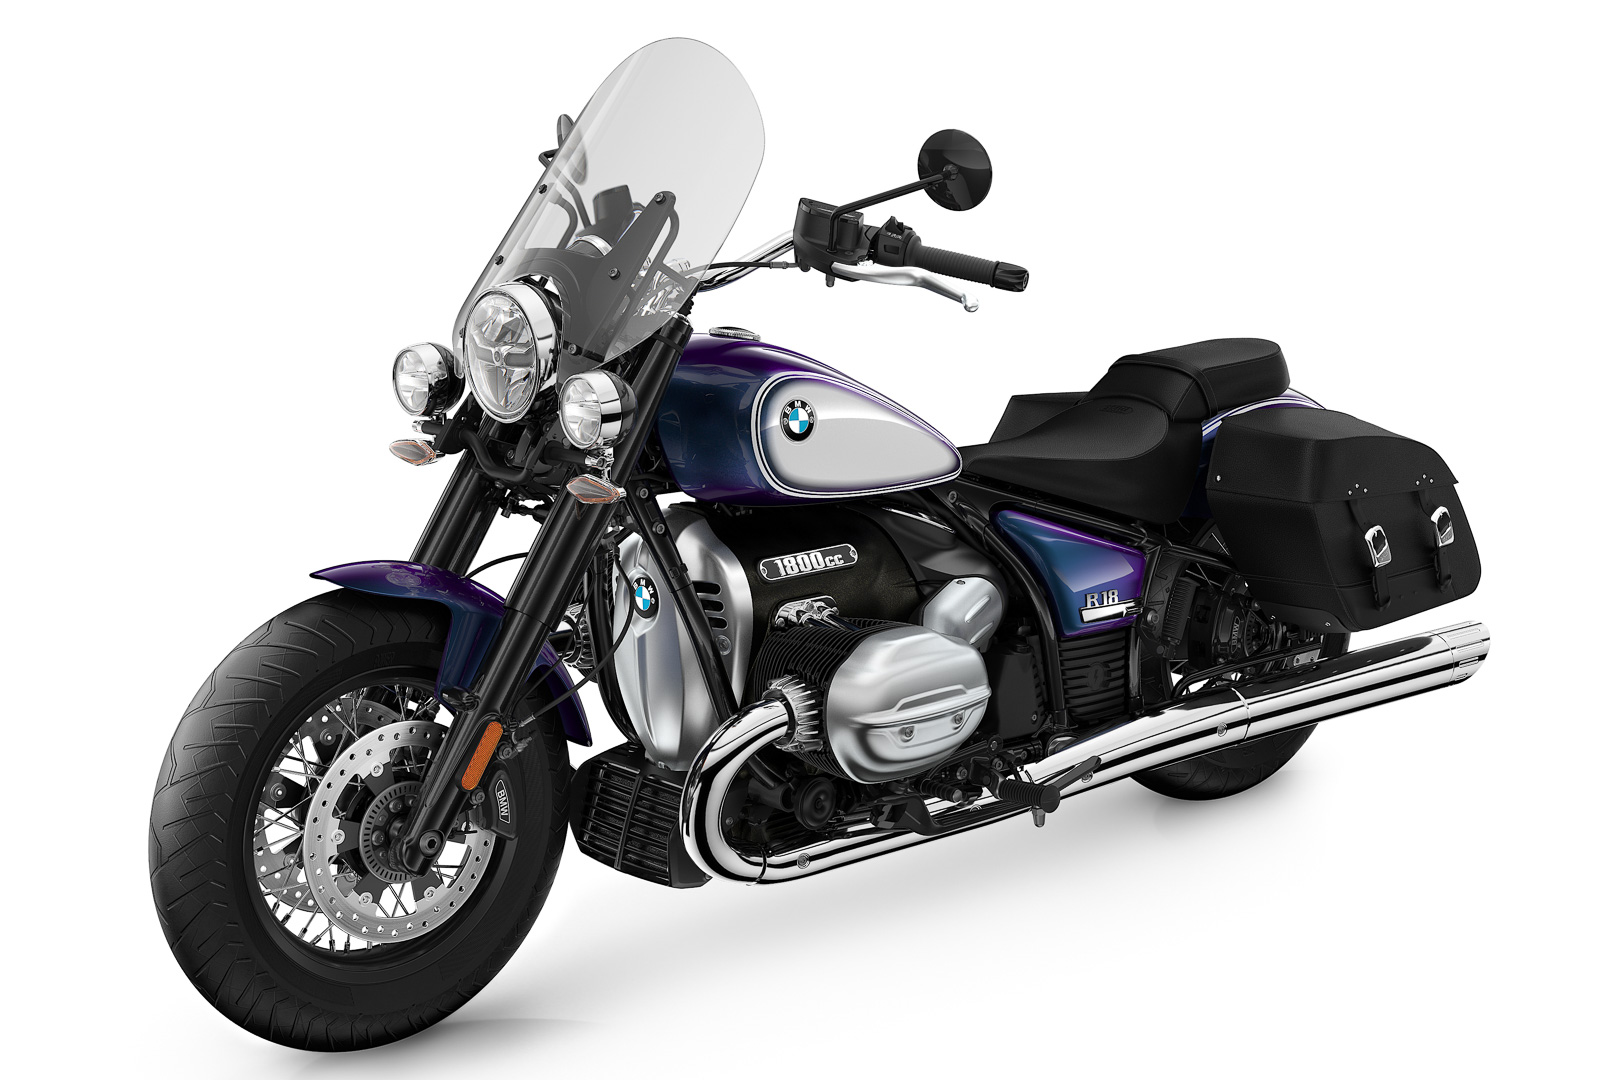 BMW R18 2022,BMW R18,bmw r18,bmw r18 price,bmw r18 review,bmw r18 for sale,bmw r18 specs,bmw r18 accessories,bmw r18 price uk,bmw r18 canada,bmw r18 top speed